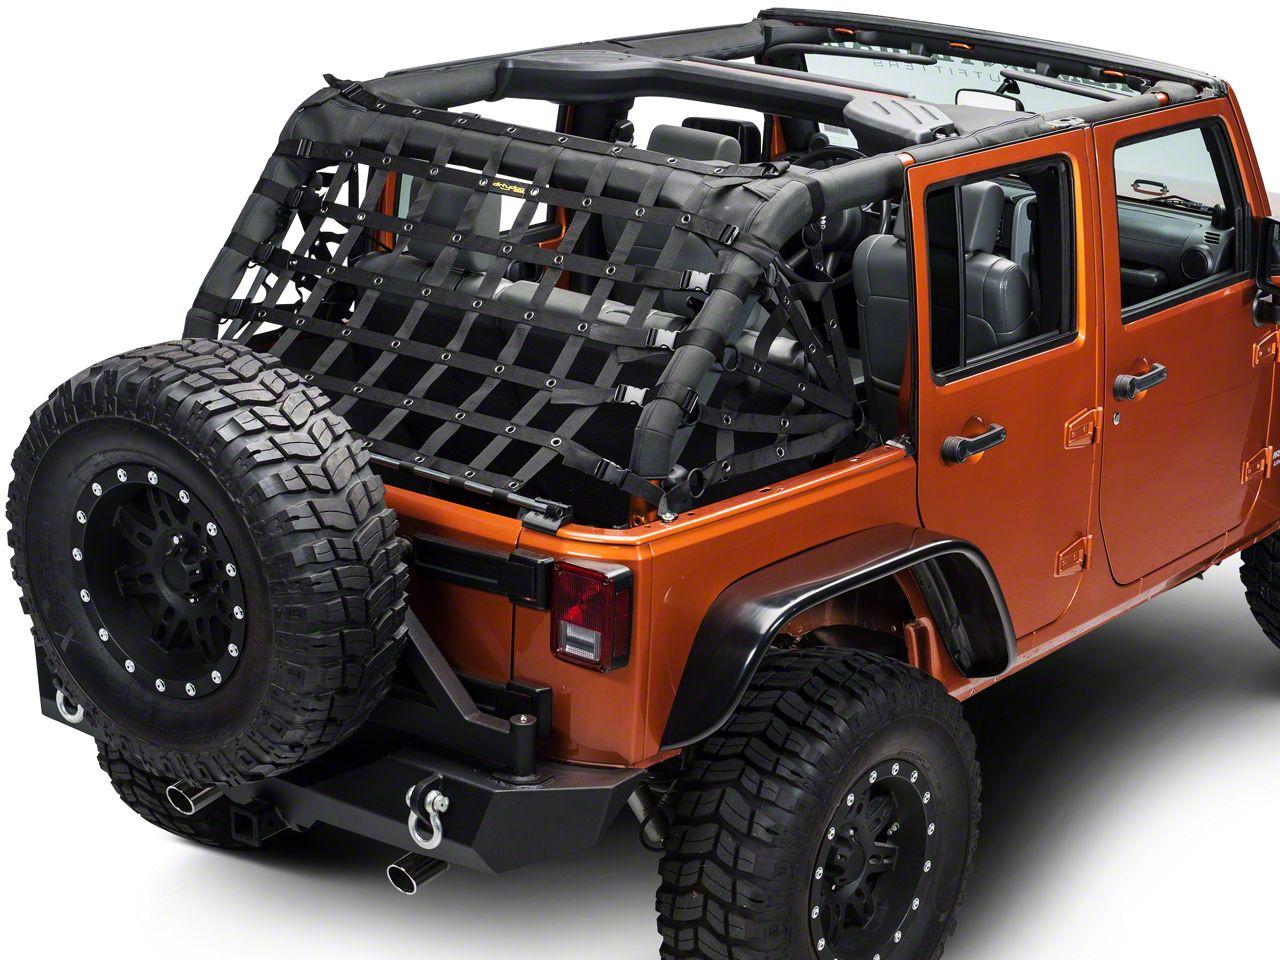 Dirty Dog 4x4 Rear Spider Netting - Black (07-18 Jeep Wrangler JK 4 Door)